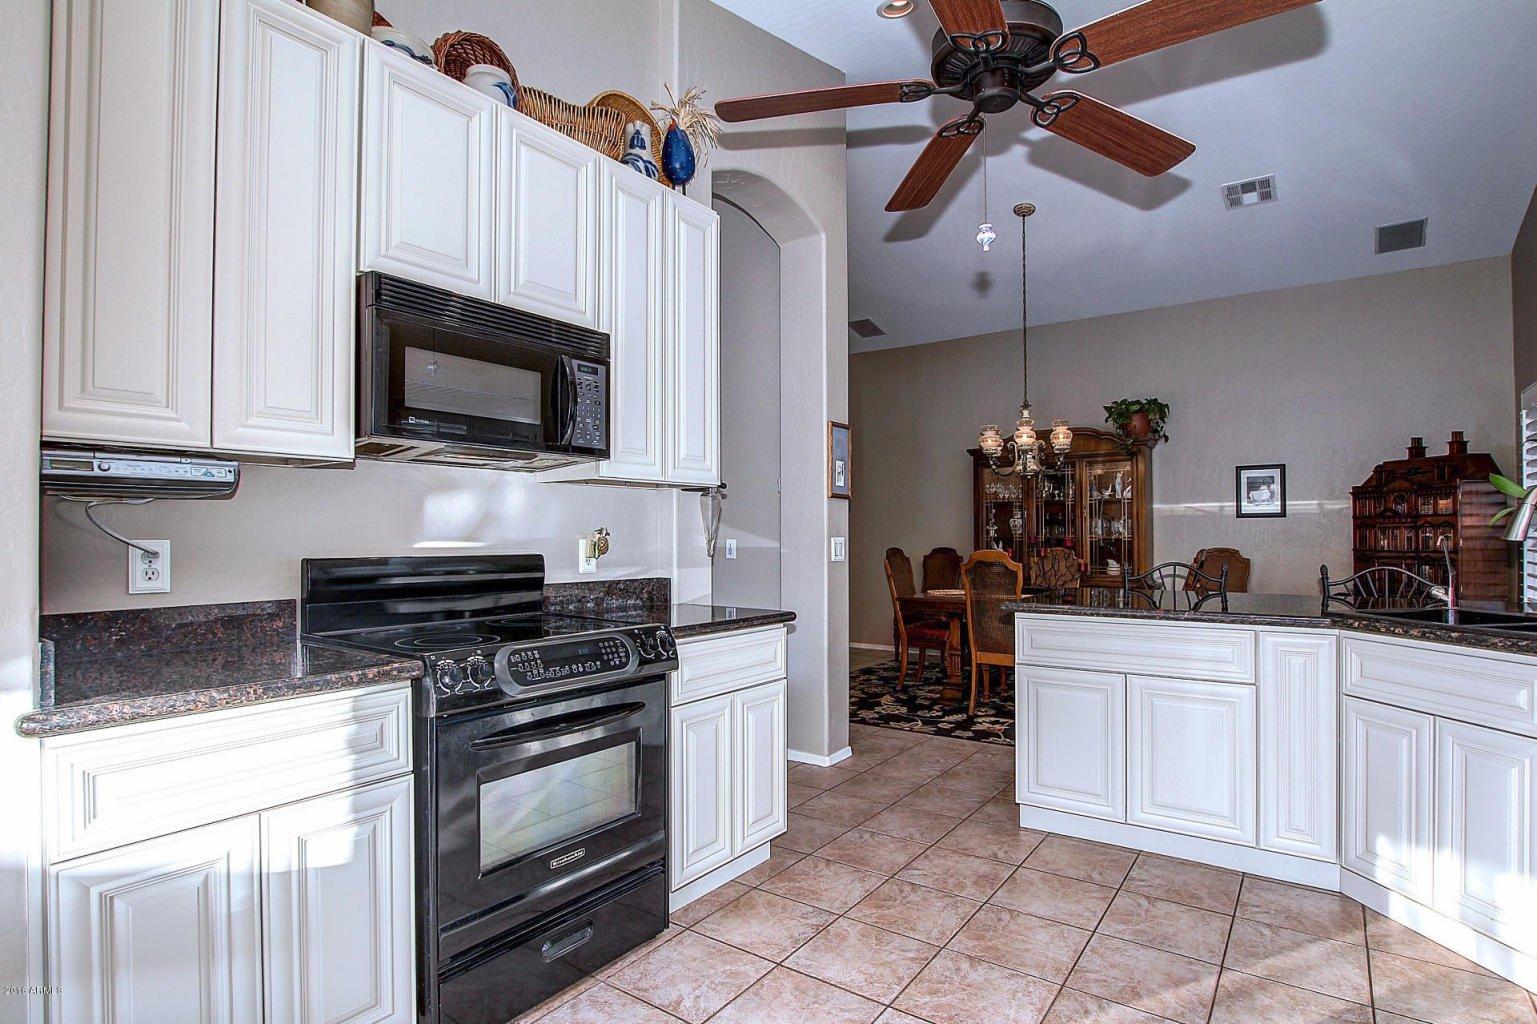 Photo 12: Photos: 3602 E Mountain Sky Avenue in Phoenix: Ahwatukee House for sale : MLS®# 5462780